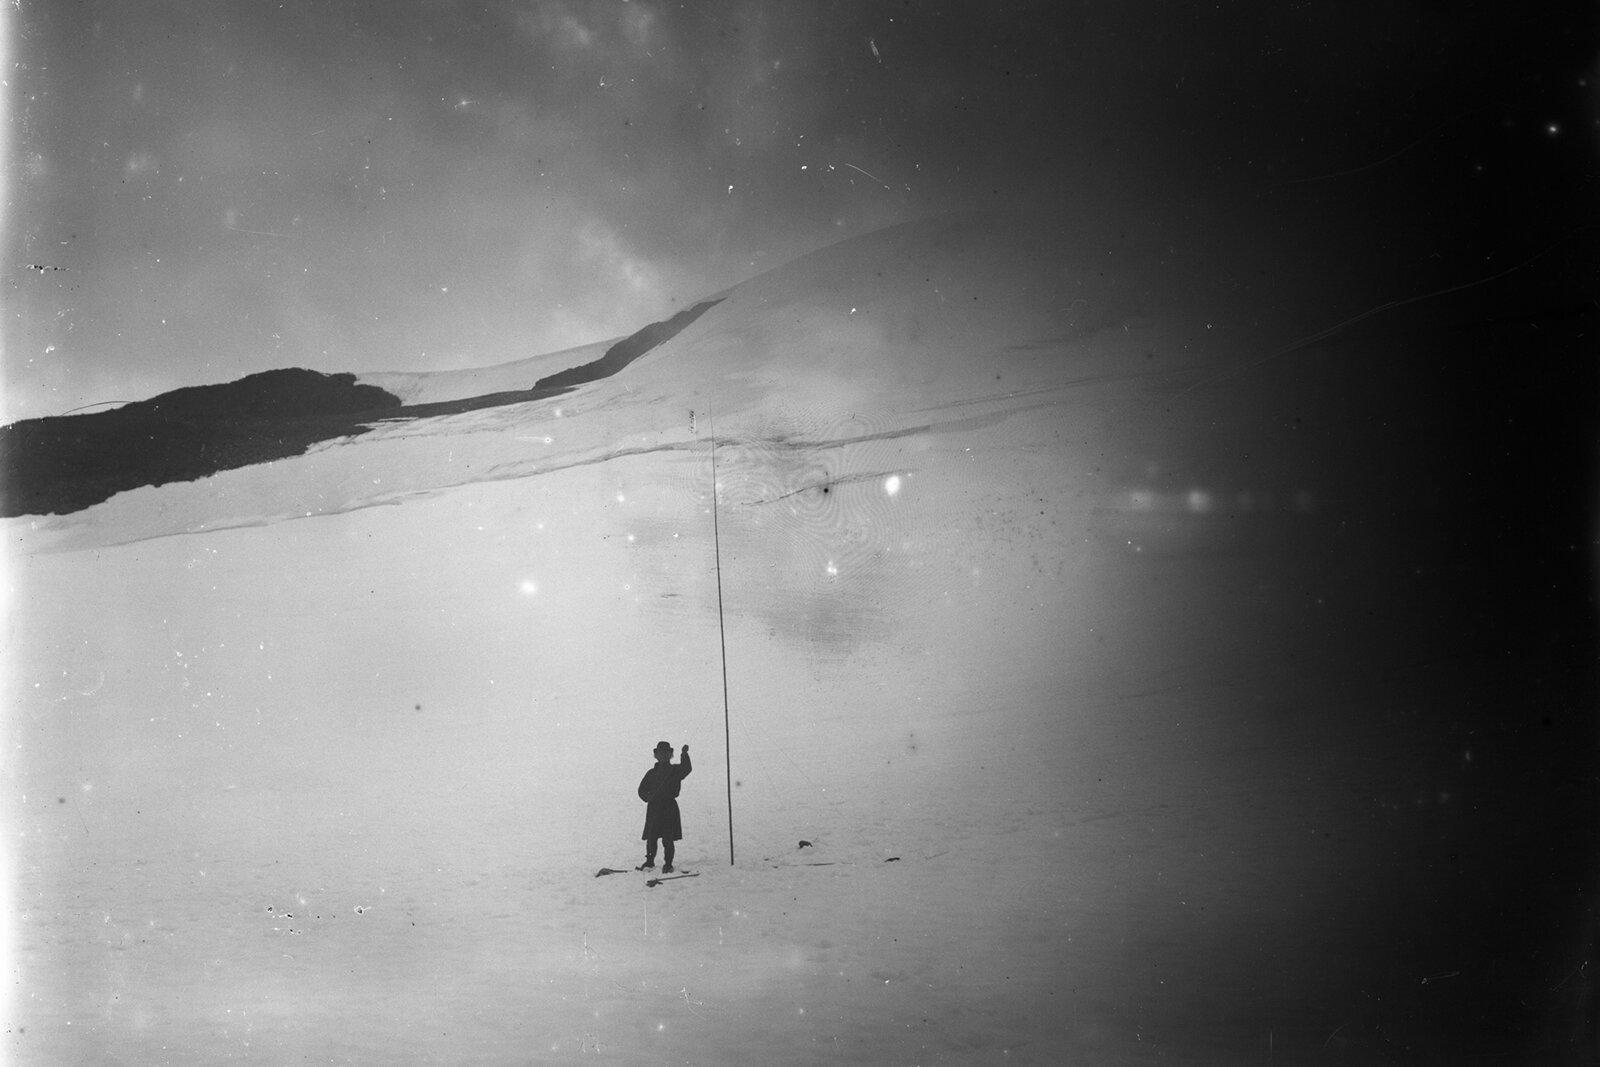 Snödjupet, The Margin of Error, fotograf Axel Hamberg.jpg